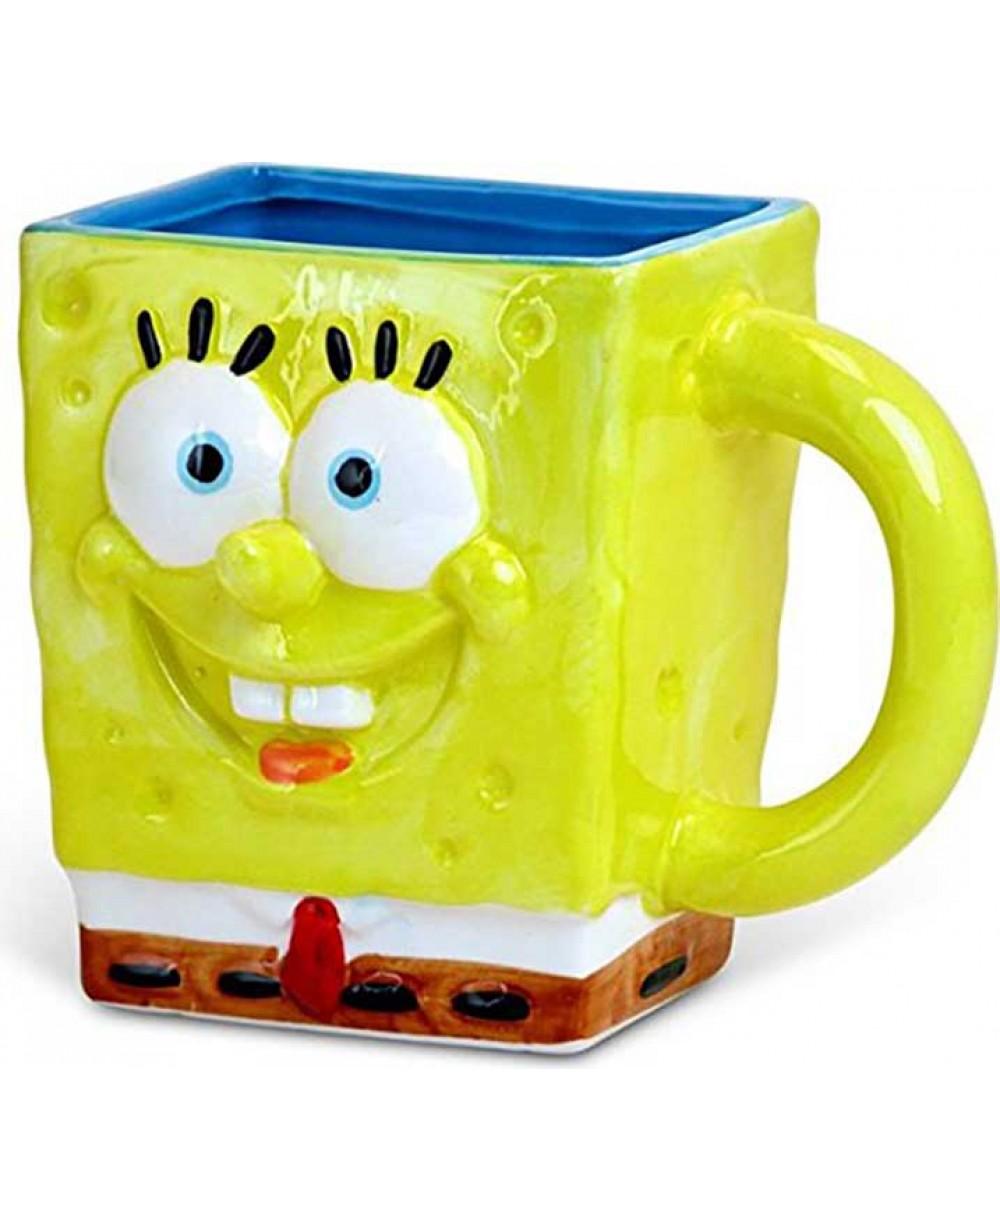 Spongebob Squarepants 3d Mug